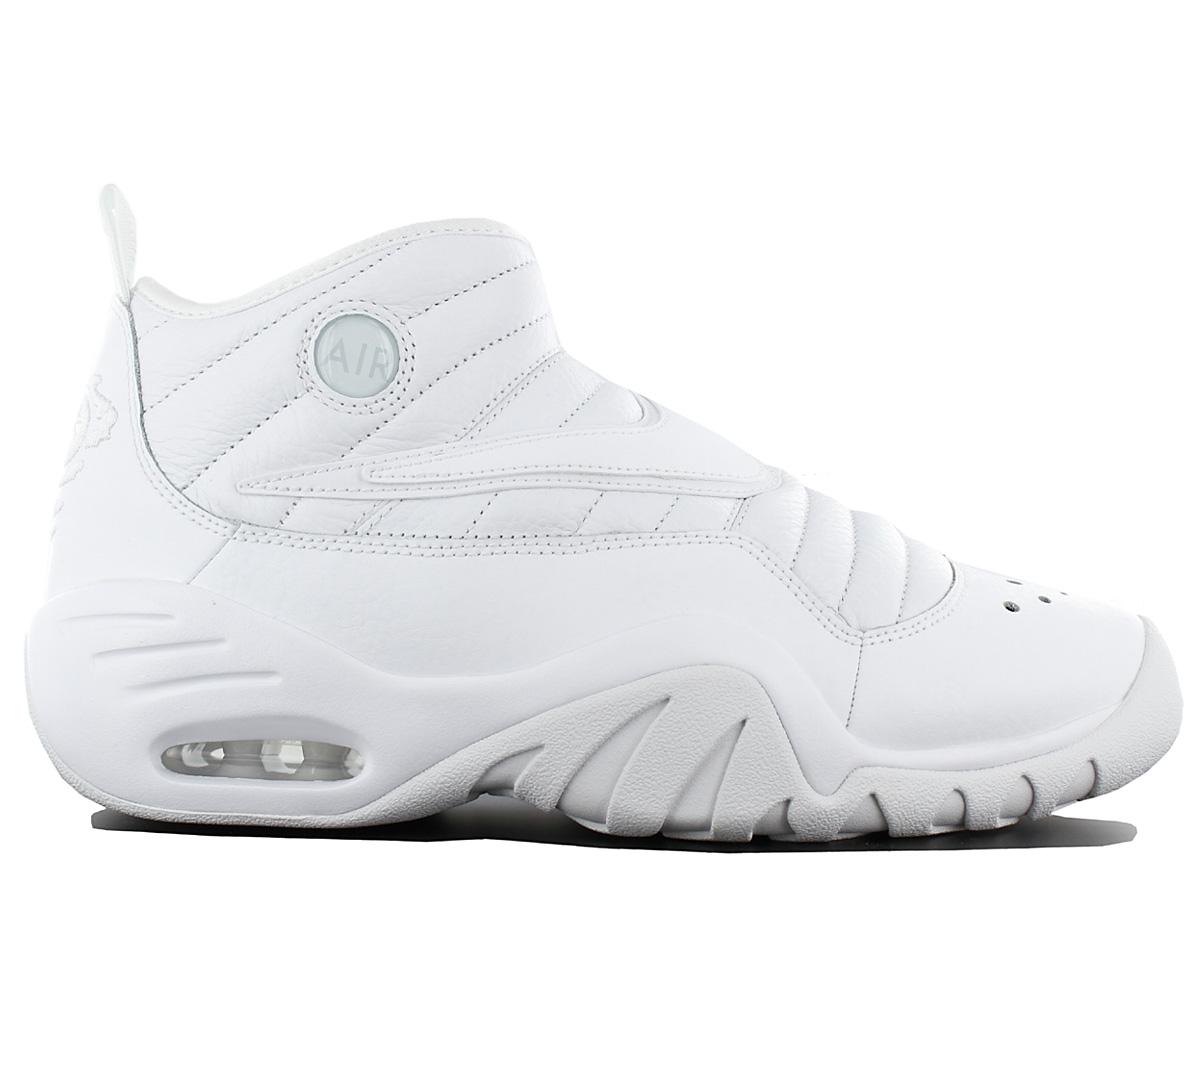 NEU Nike Air Max Shake Ndestrukt Herren Schuhe Leder Wei 880869 101 SALE